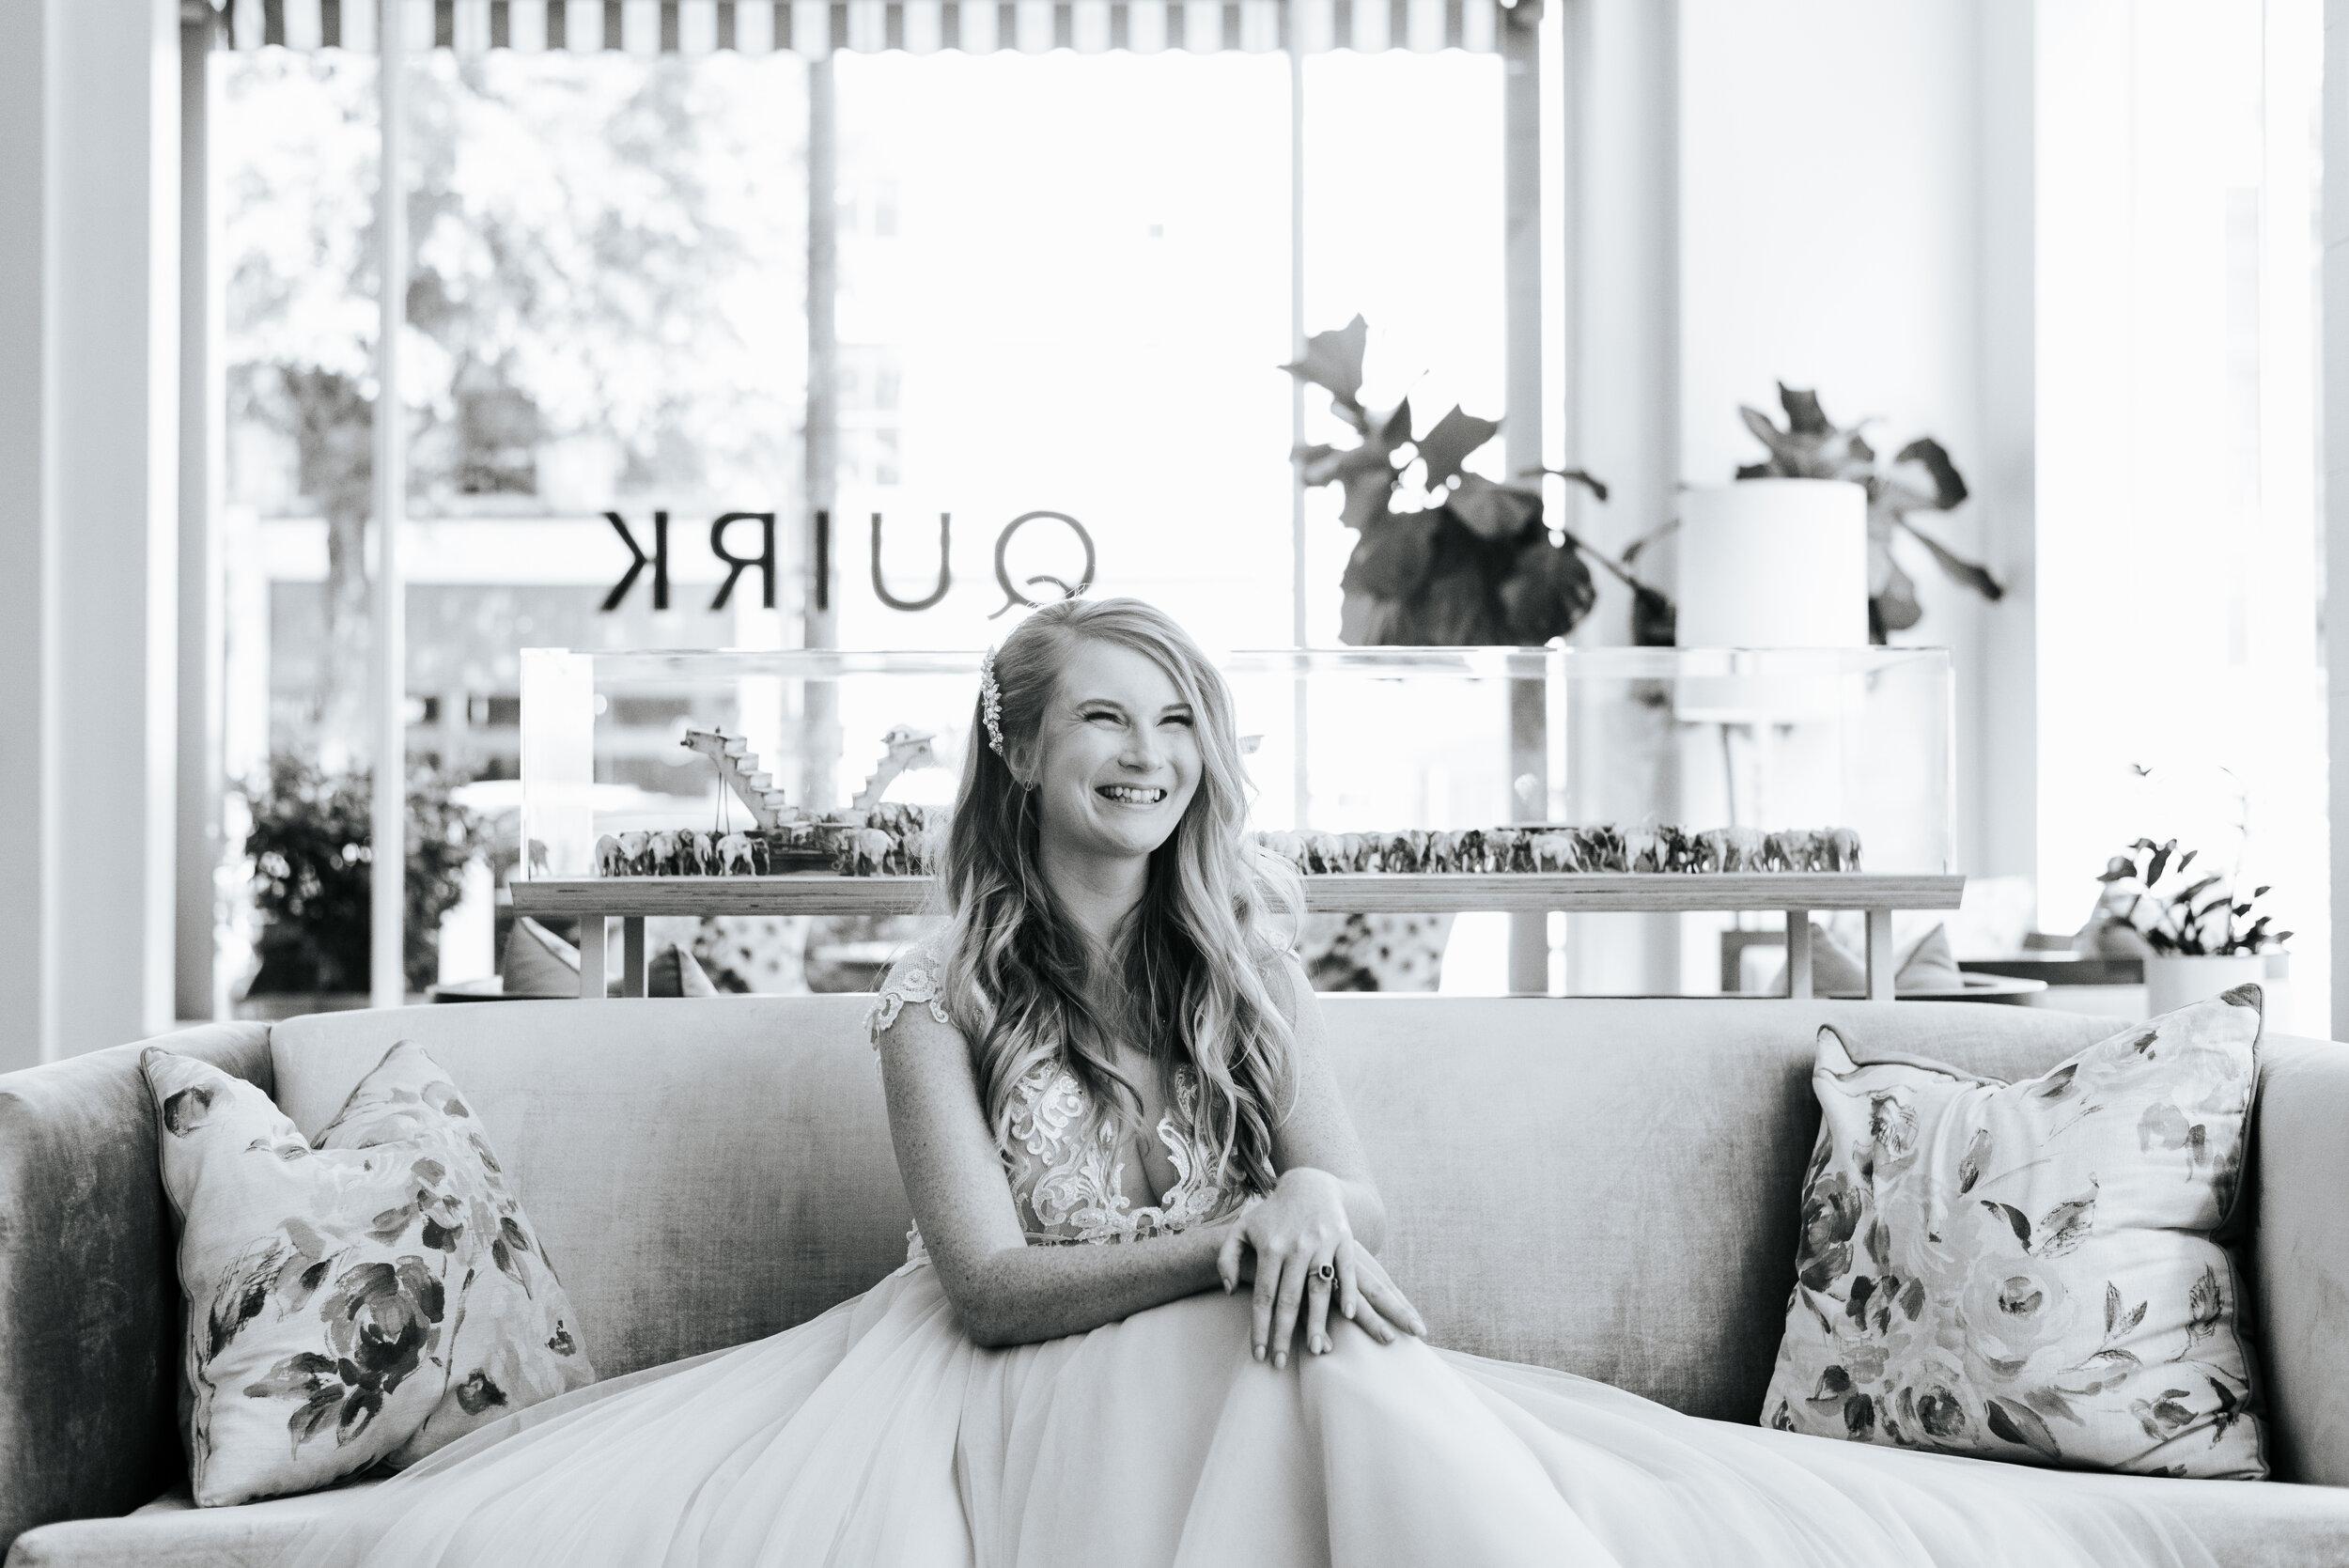 Cassie-Mrunal-Wedding-Quirk-Hotel-John-Marshall-Ballrooms-Richmond-Virginia-Photography-by-V-22.jpg